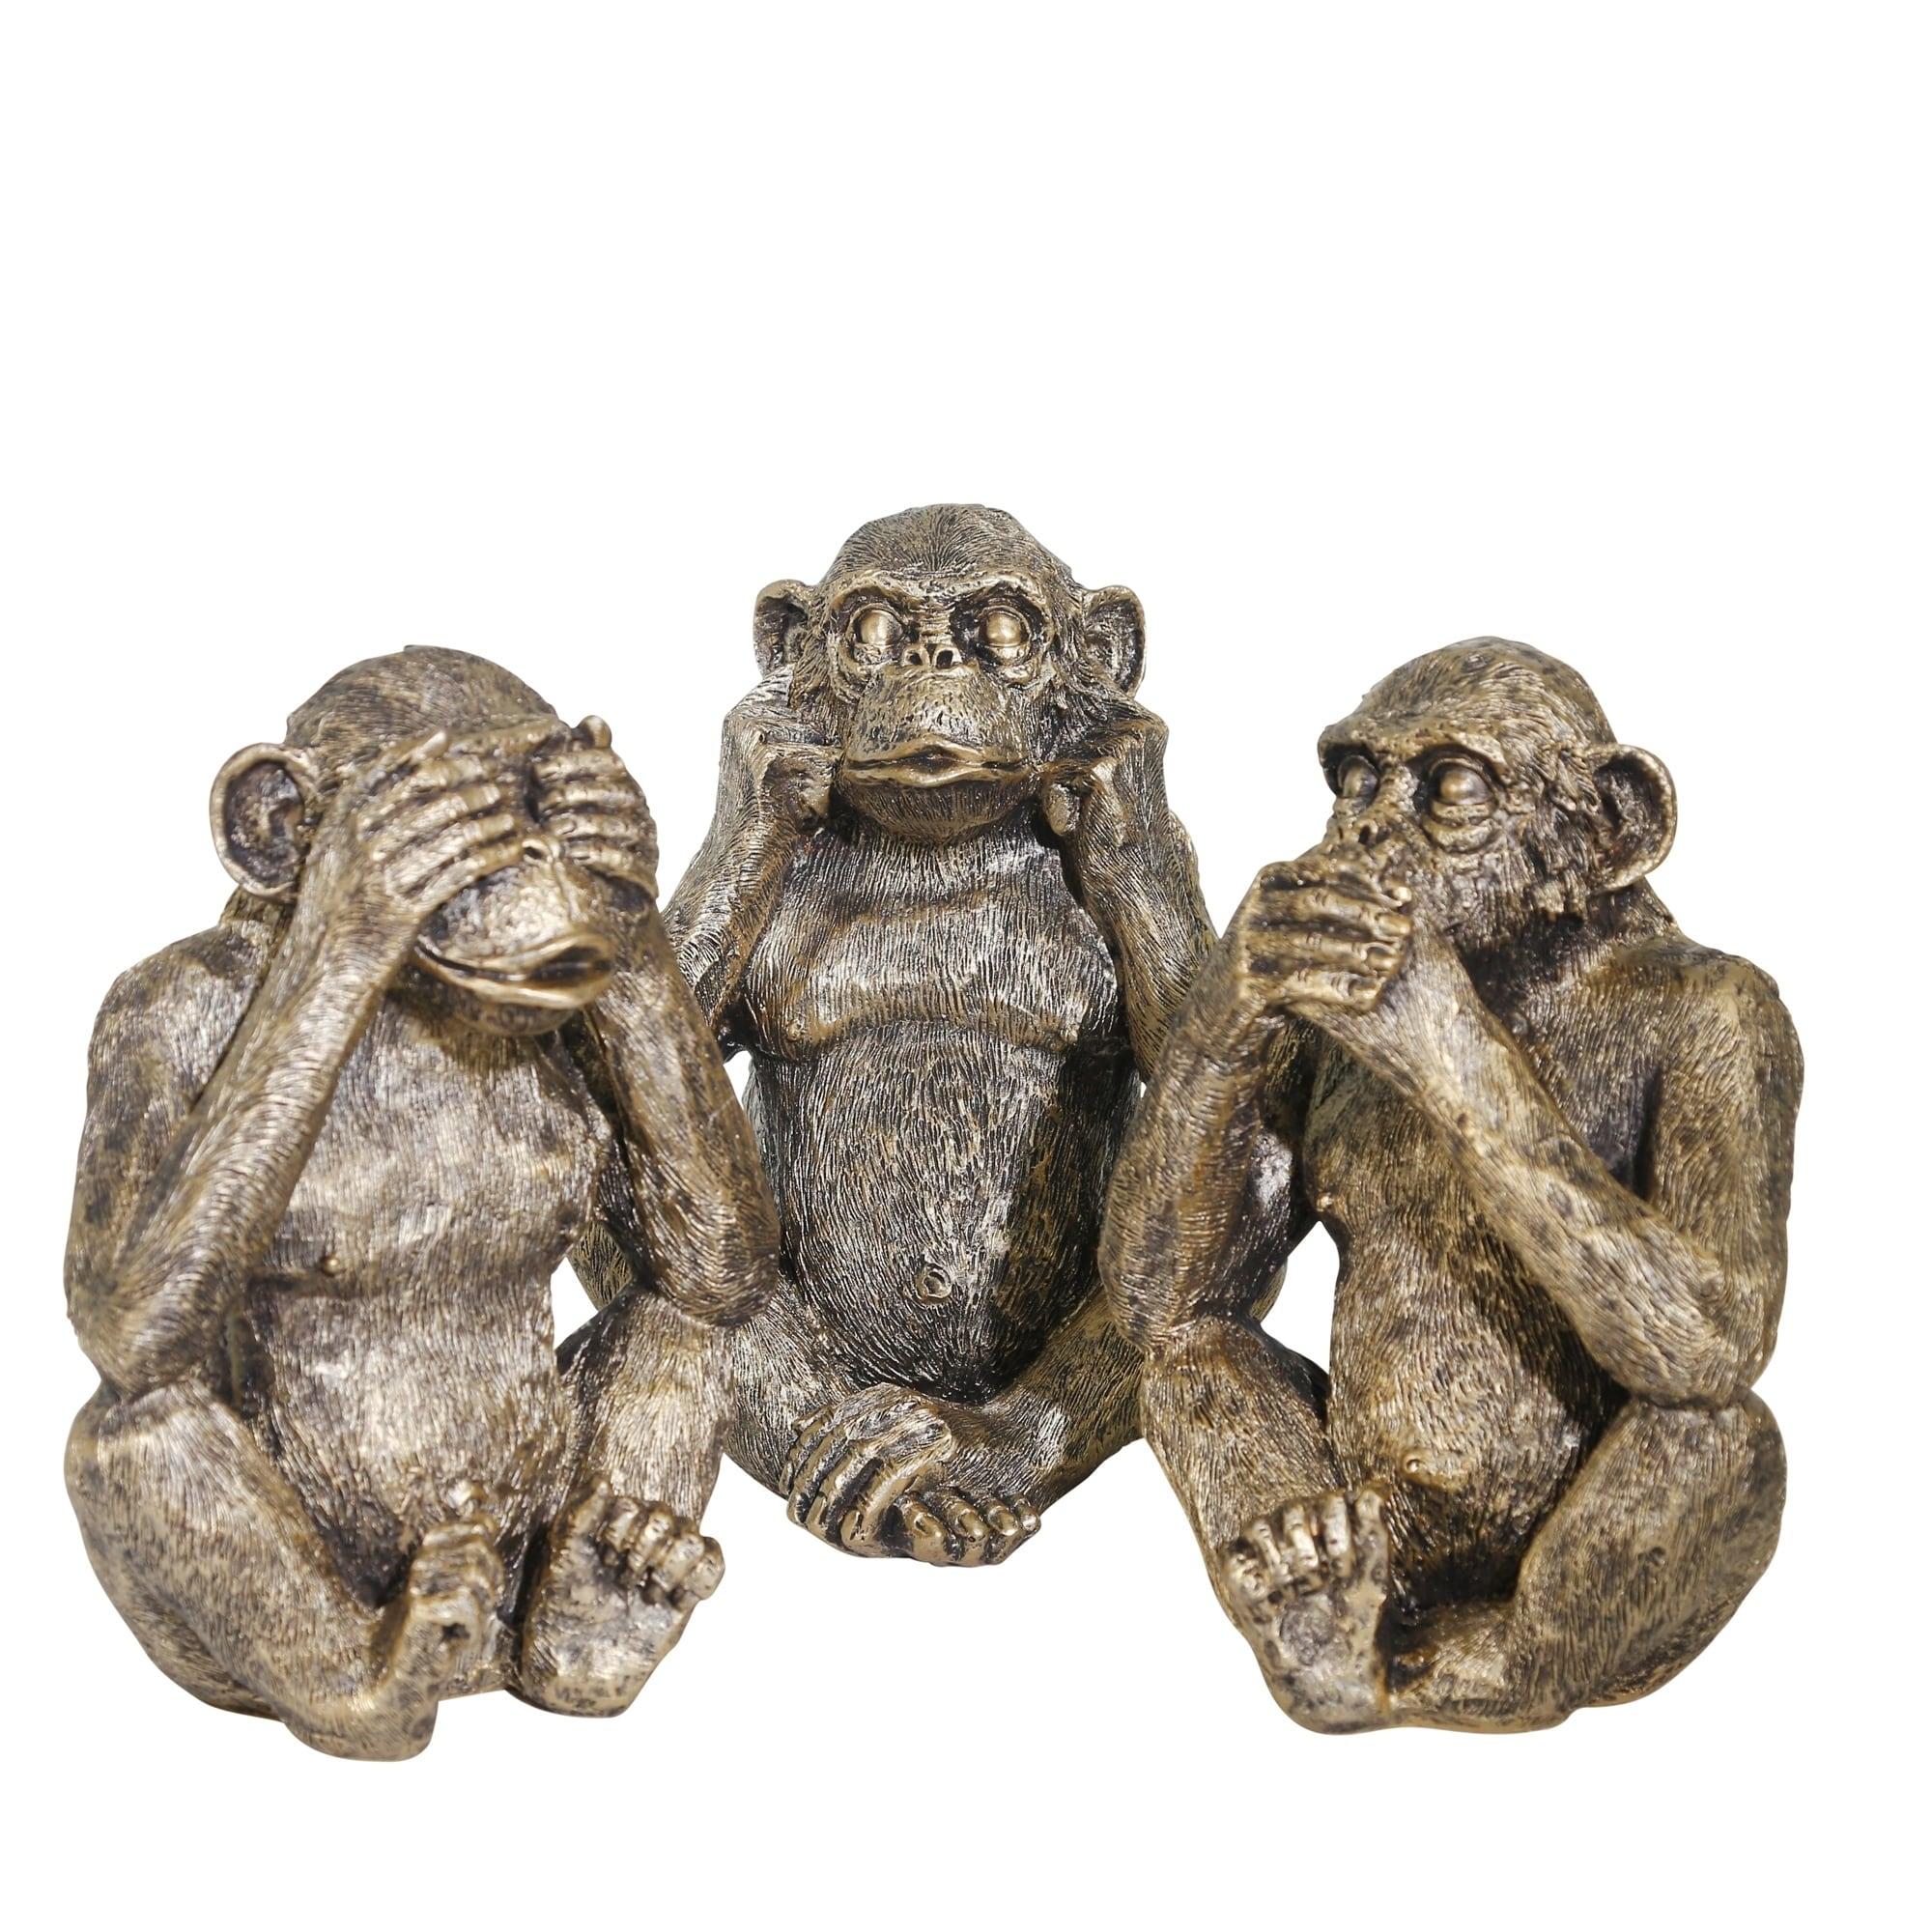 NIB! See,Speak Hear No Evil Monkeys Resin By Falcon Miniatures Dollhouse